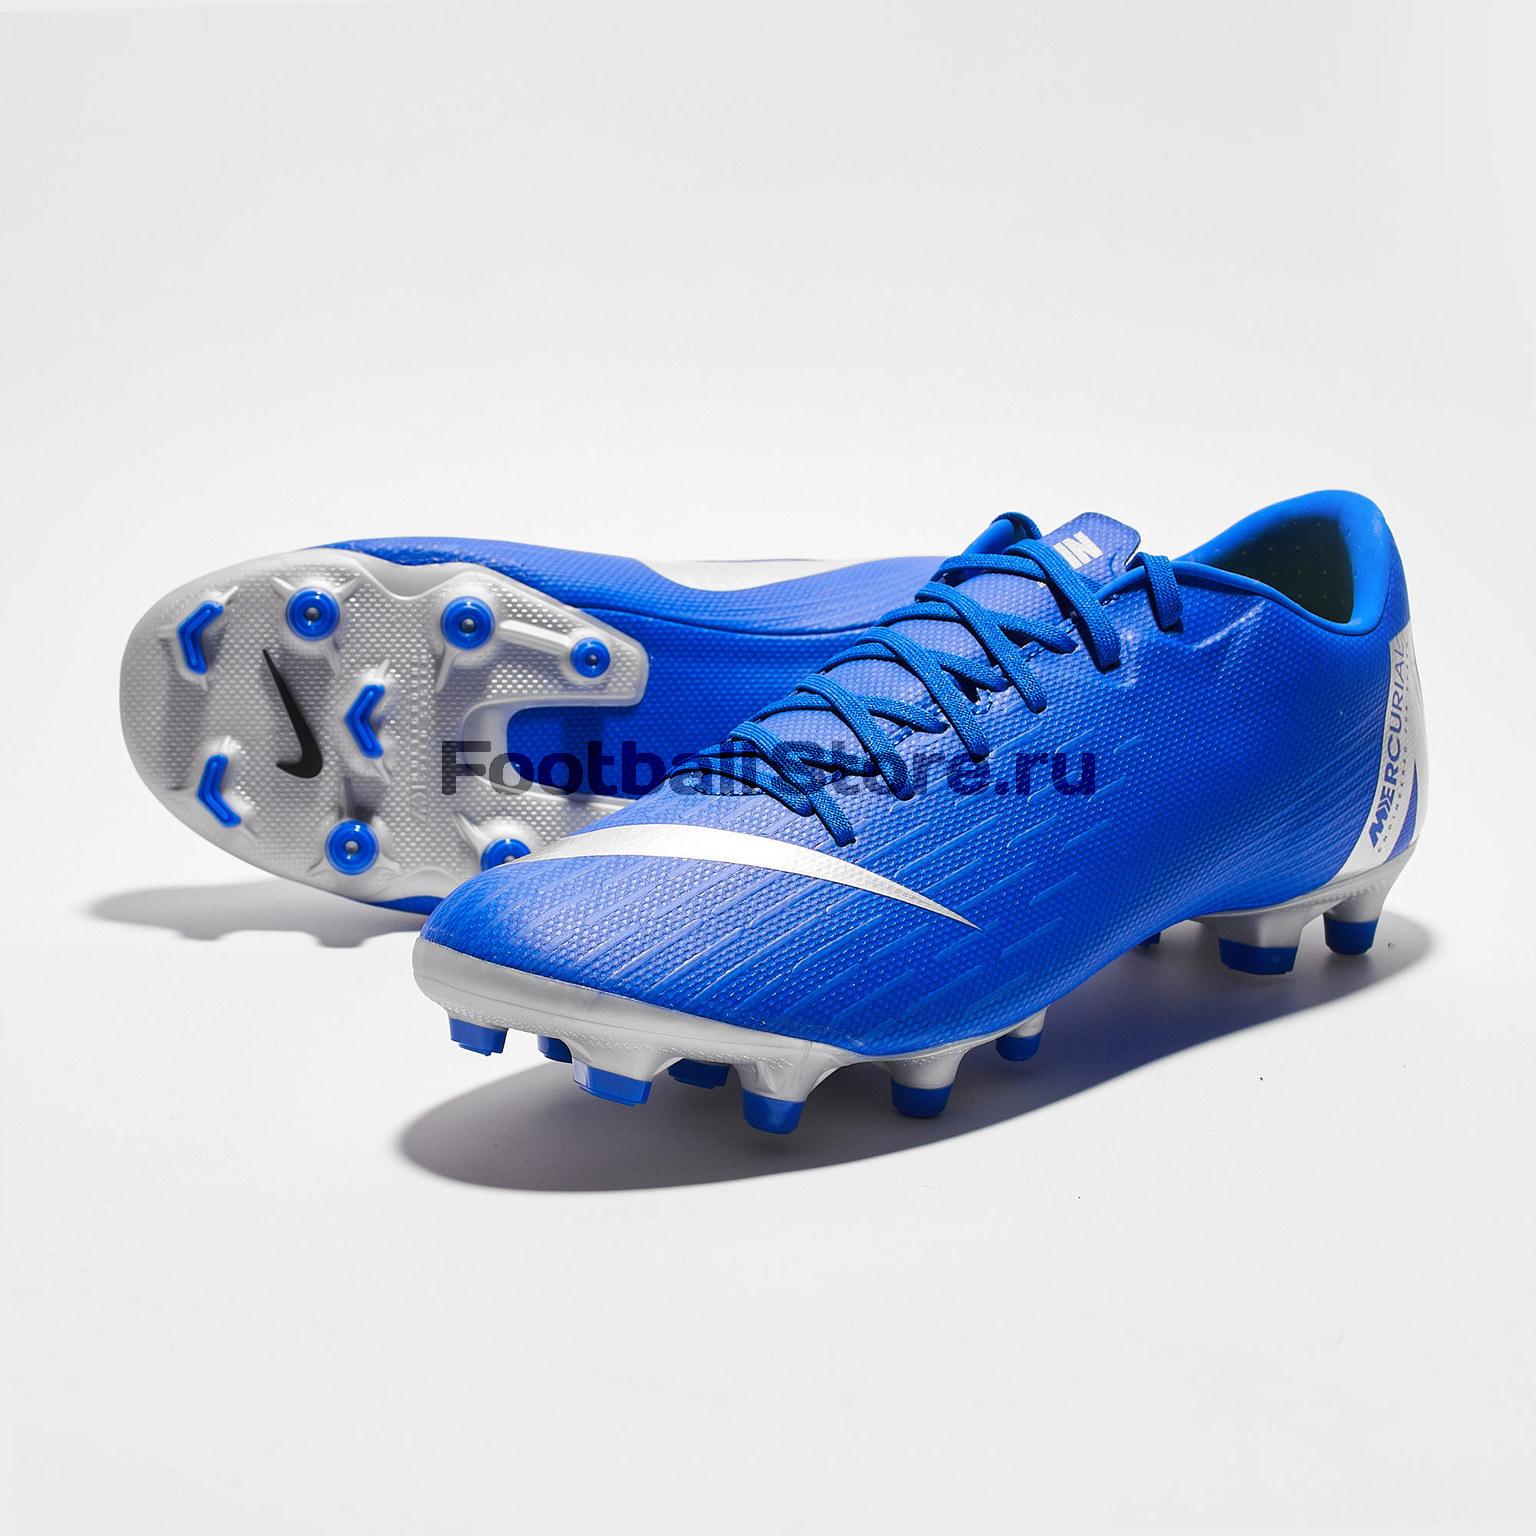 Бутсы Nike Vapor 12 Academy FG/MG AH7375-400